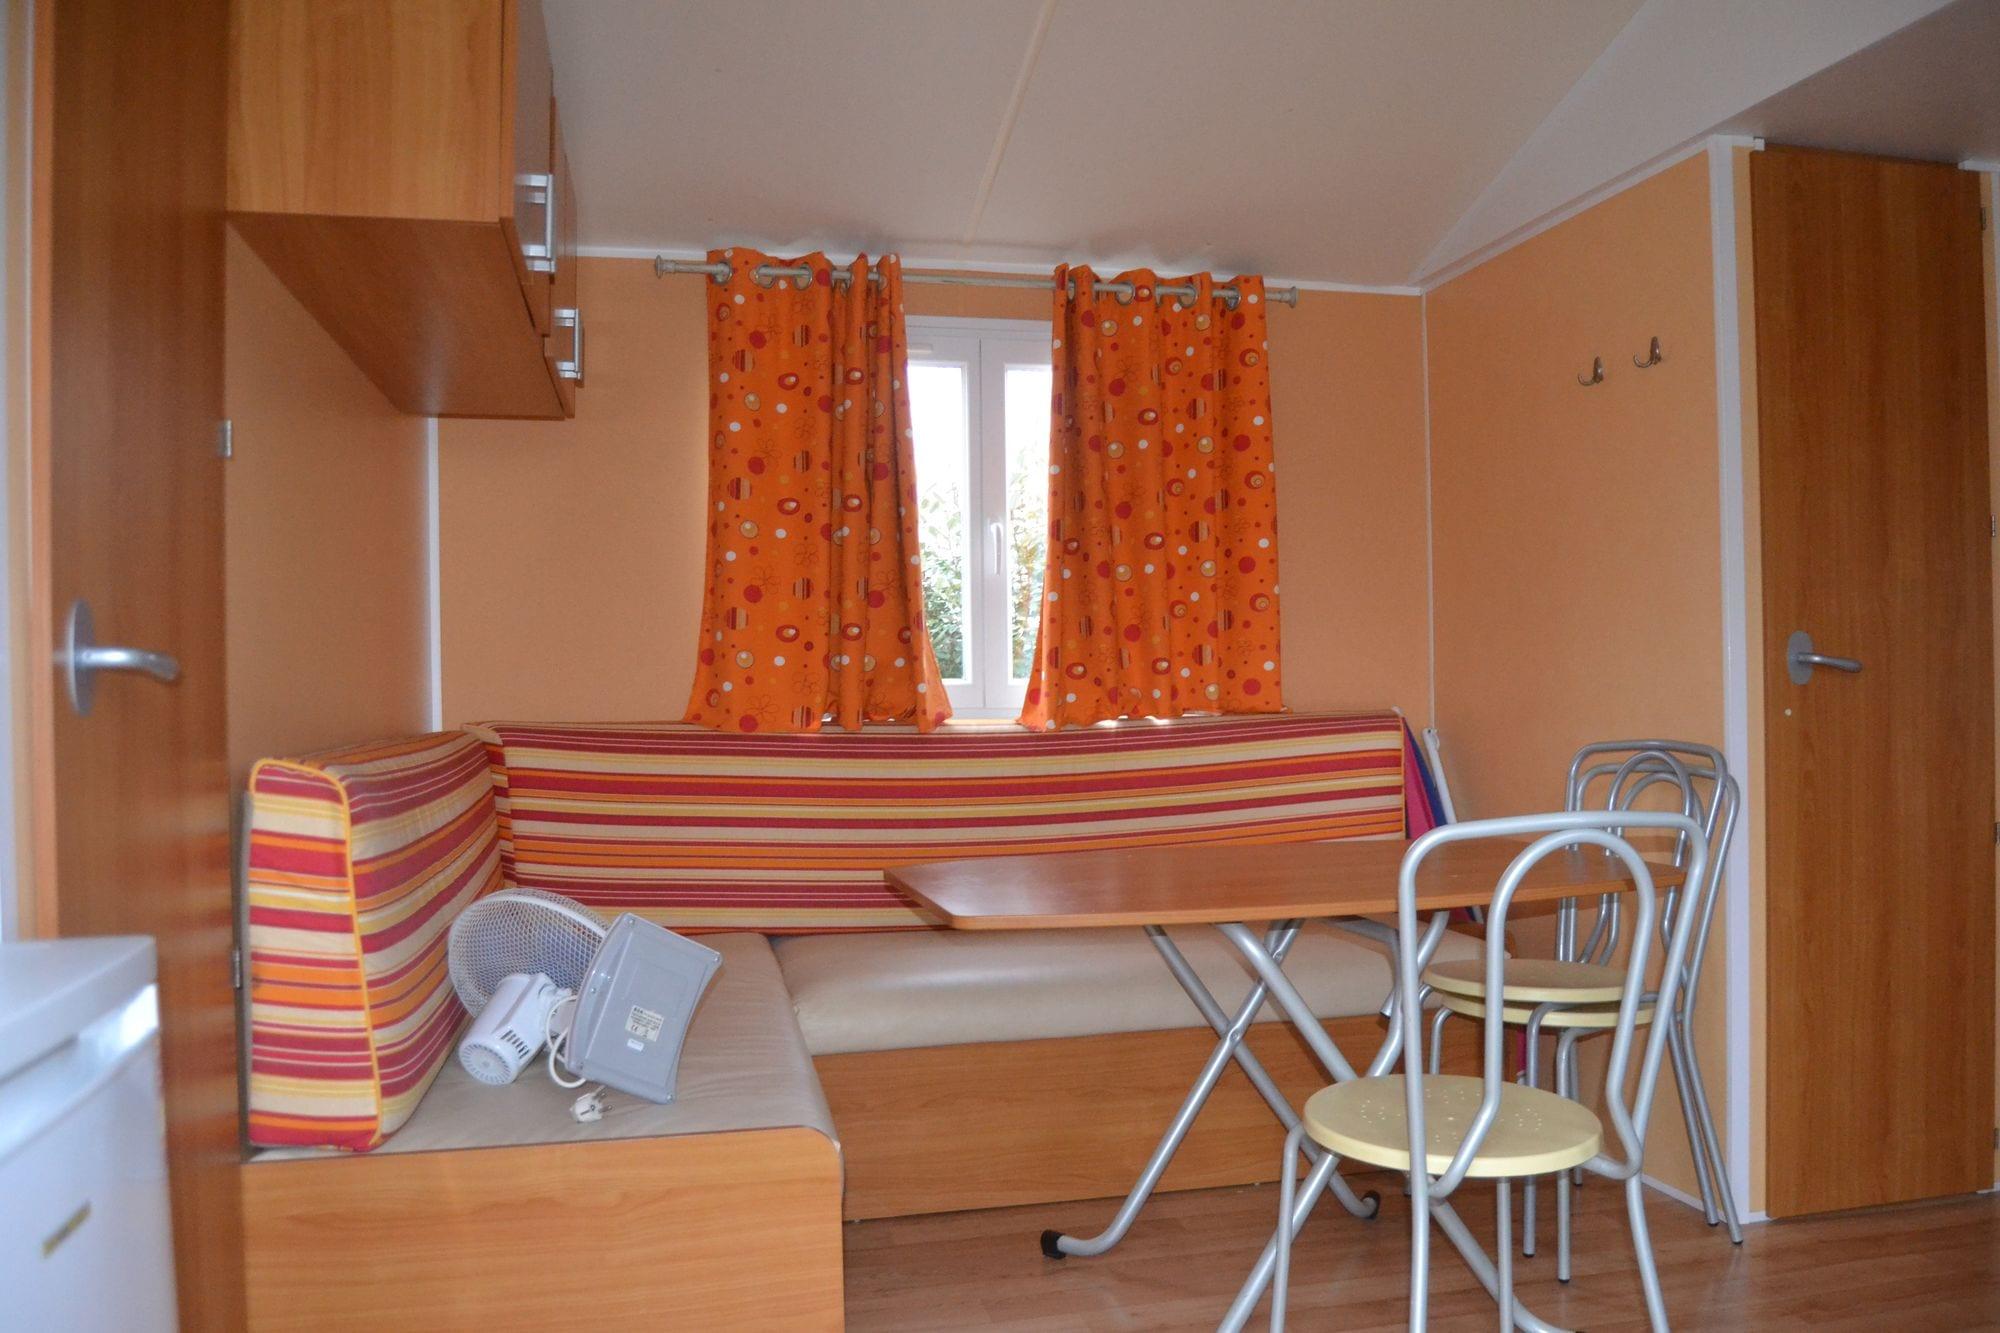 Trigano sympas 2007 mobil home occasion 6 000 zen mobil home - Mobil home 3 chambres occasion ...